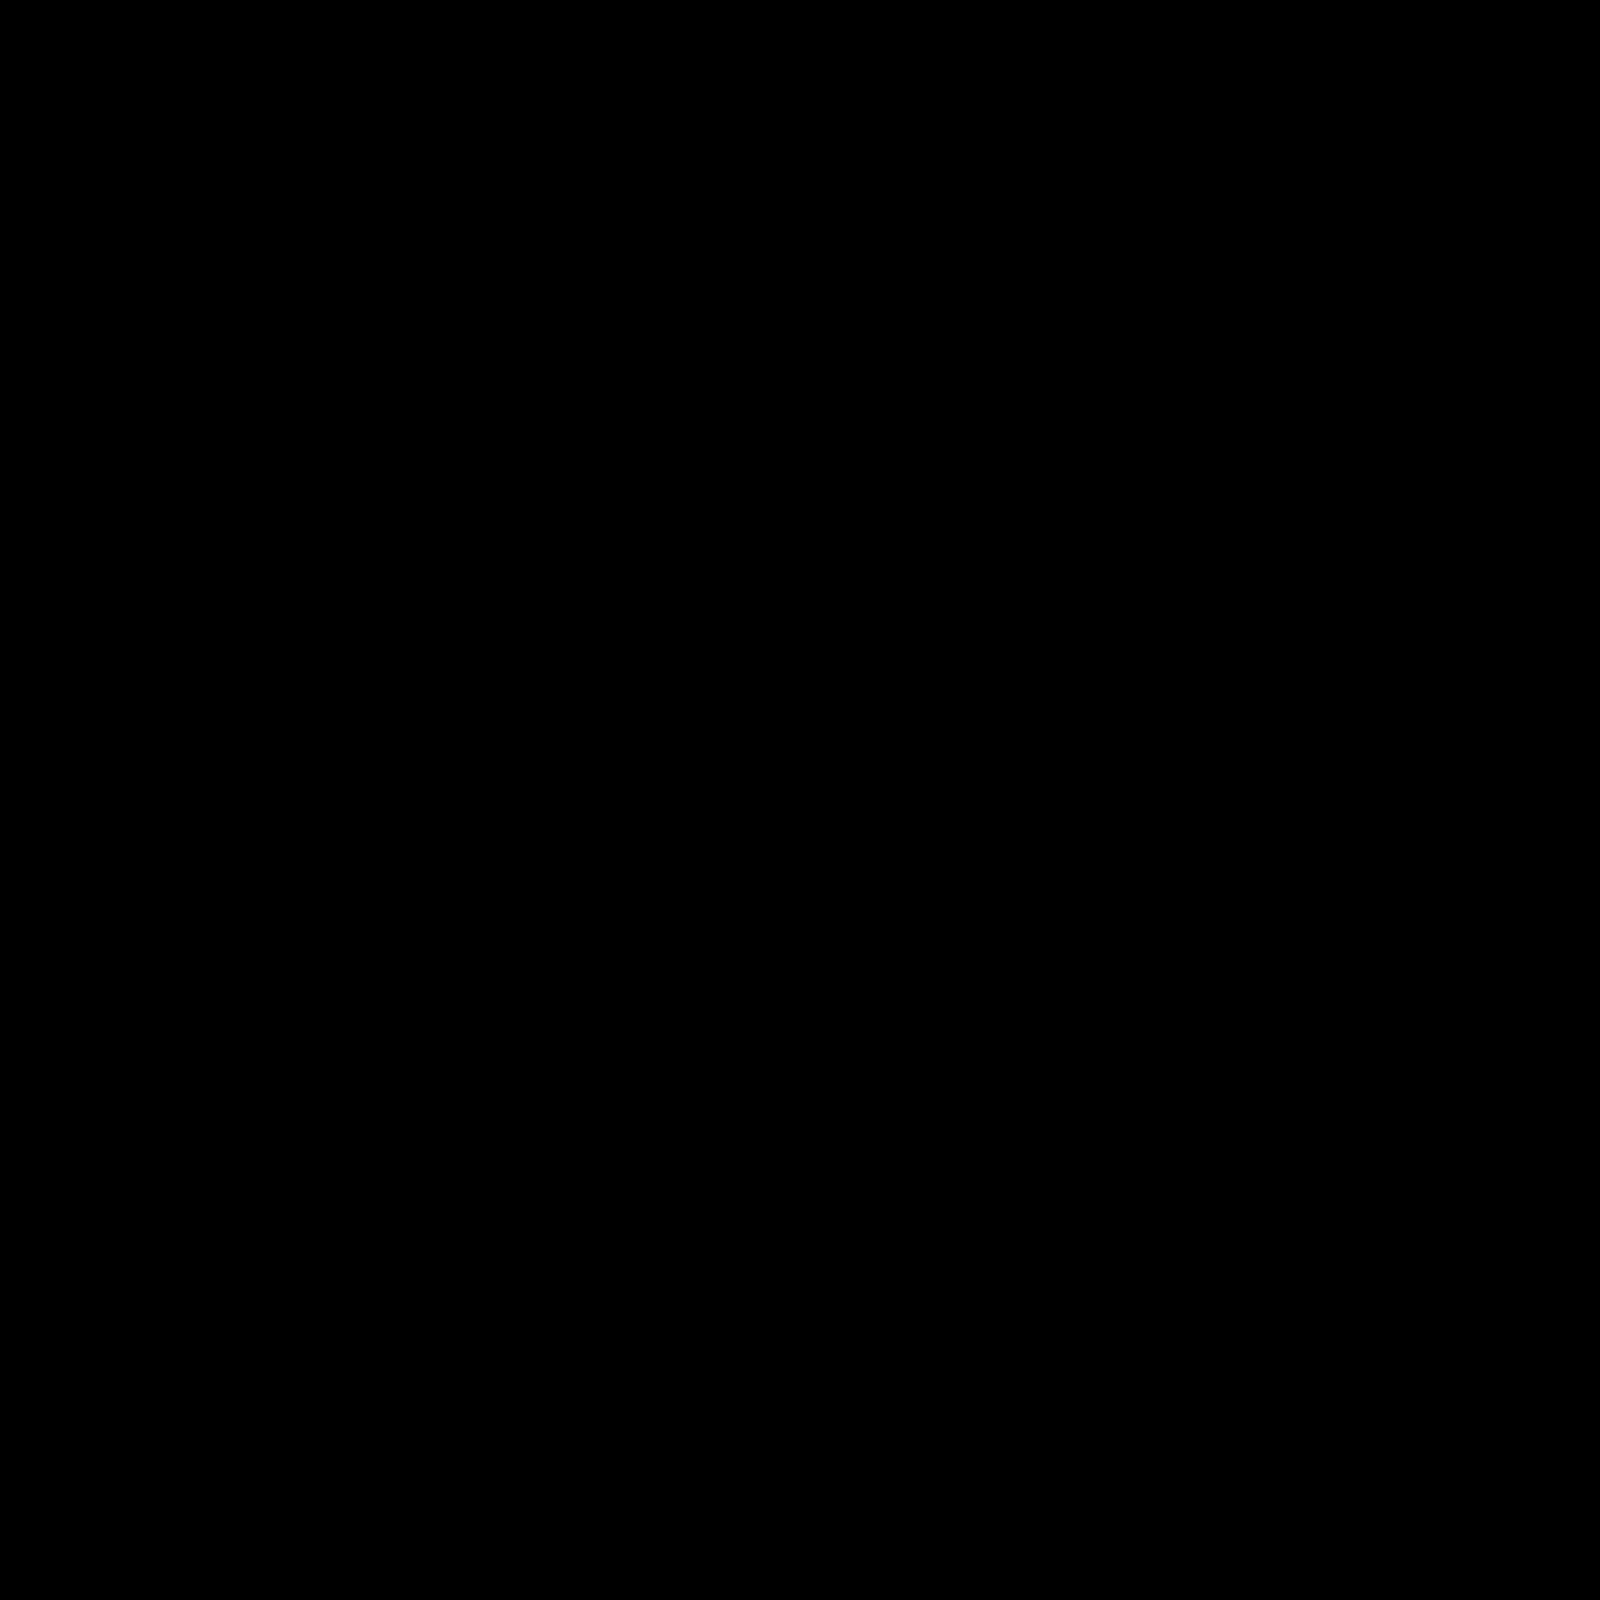 Solo Cup icon